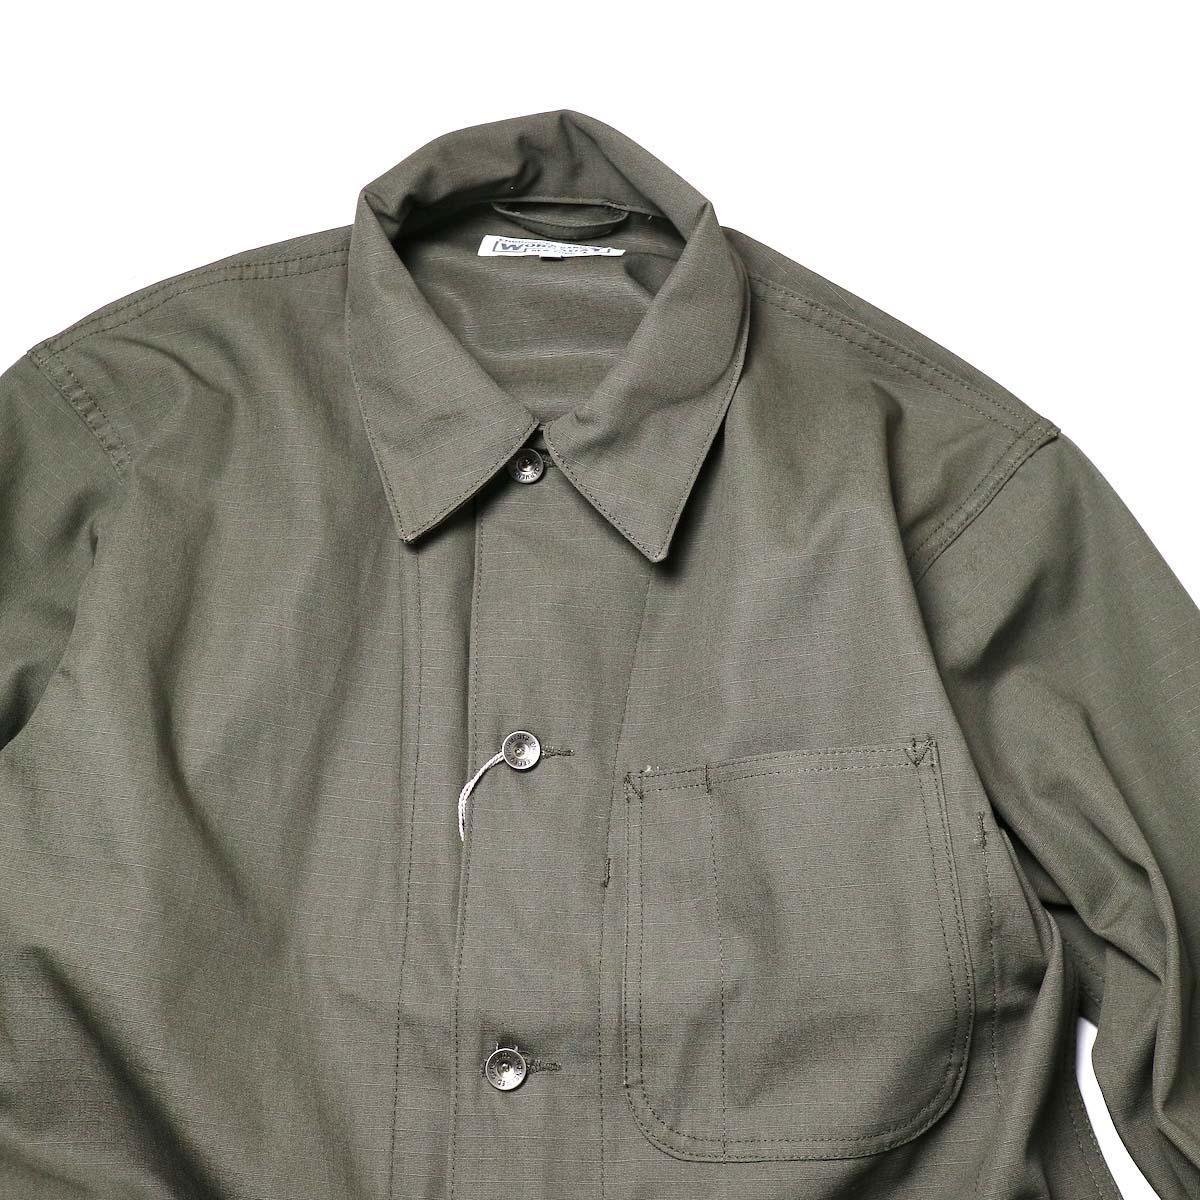 Engineered Garments Workaday / Utility Jacket - Cotton Ripstop (Olive)襟